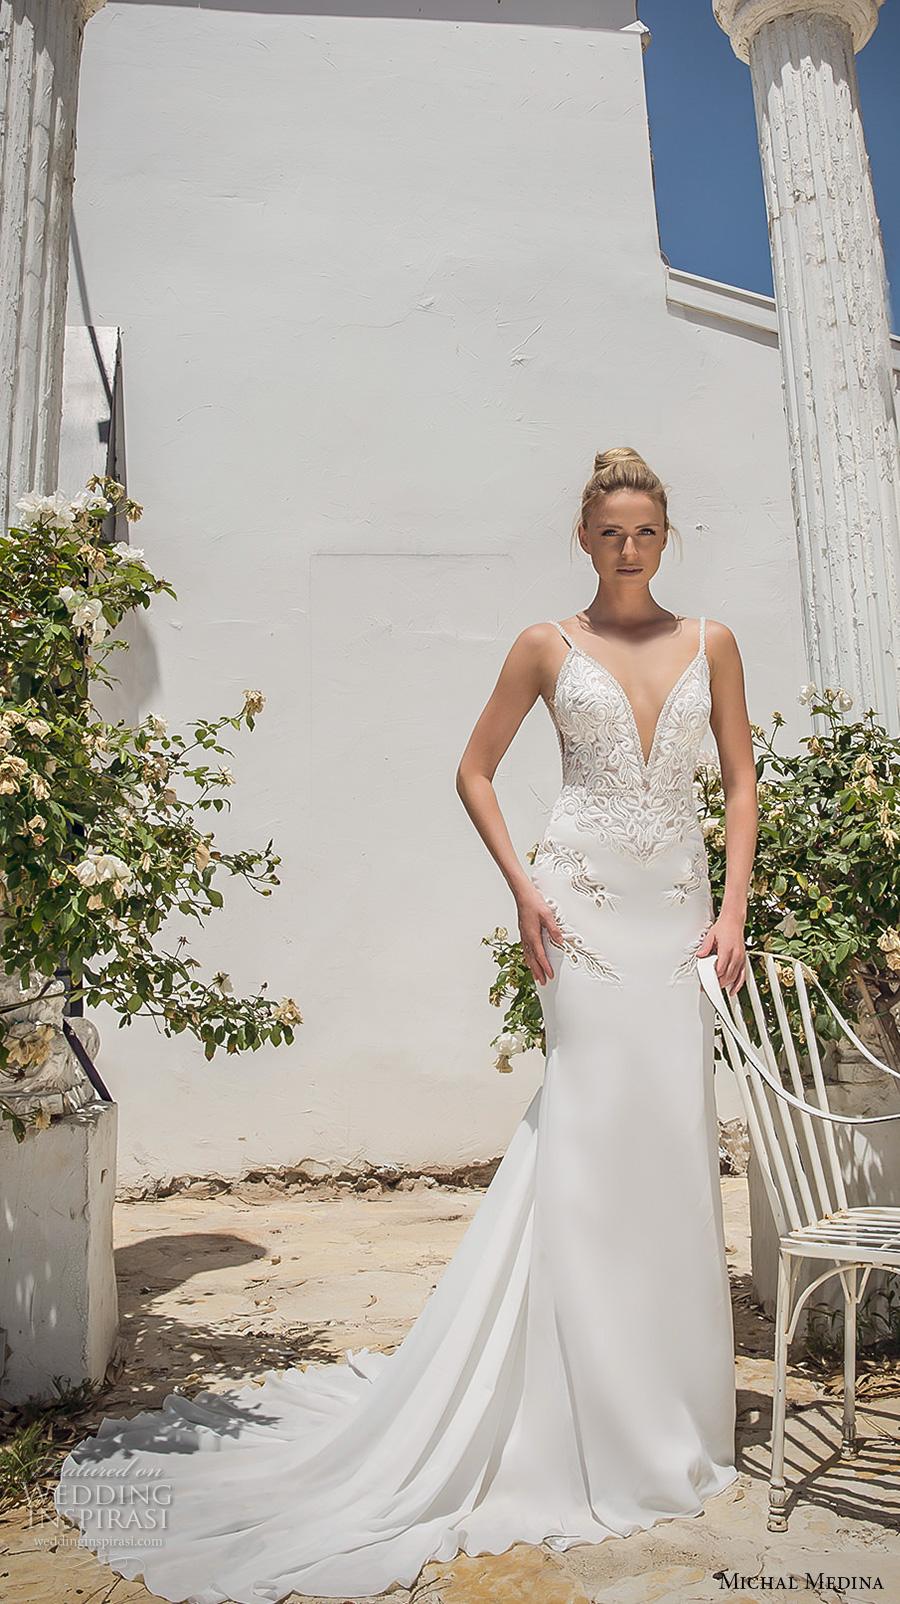 michal medina 2017 bridal spagetti strap deep plunging sweetheart neckline heavily embellished bodice elegant sheath wedding dress open low back chapel train (dianne) mv